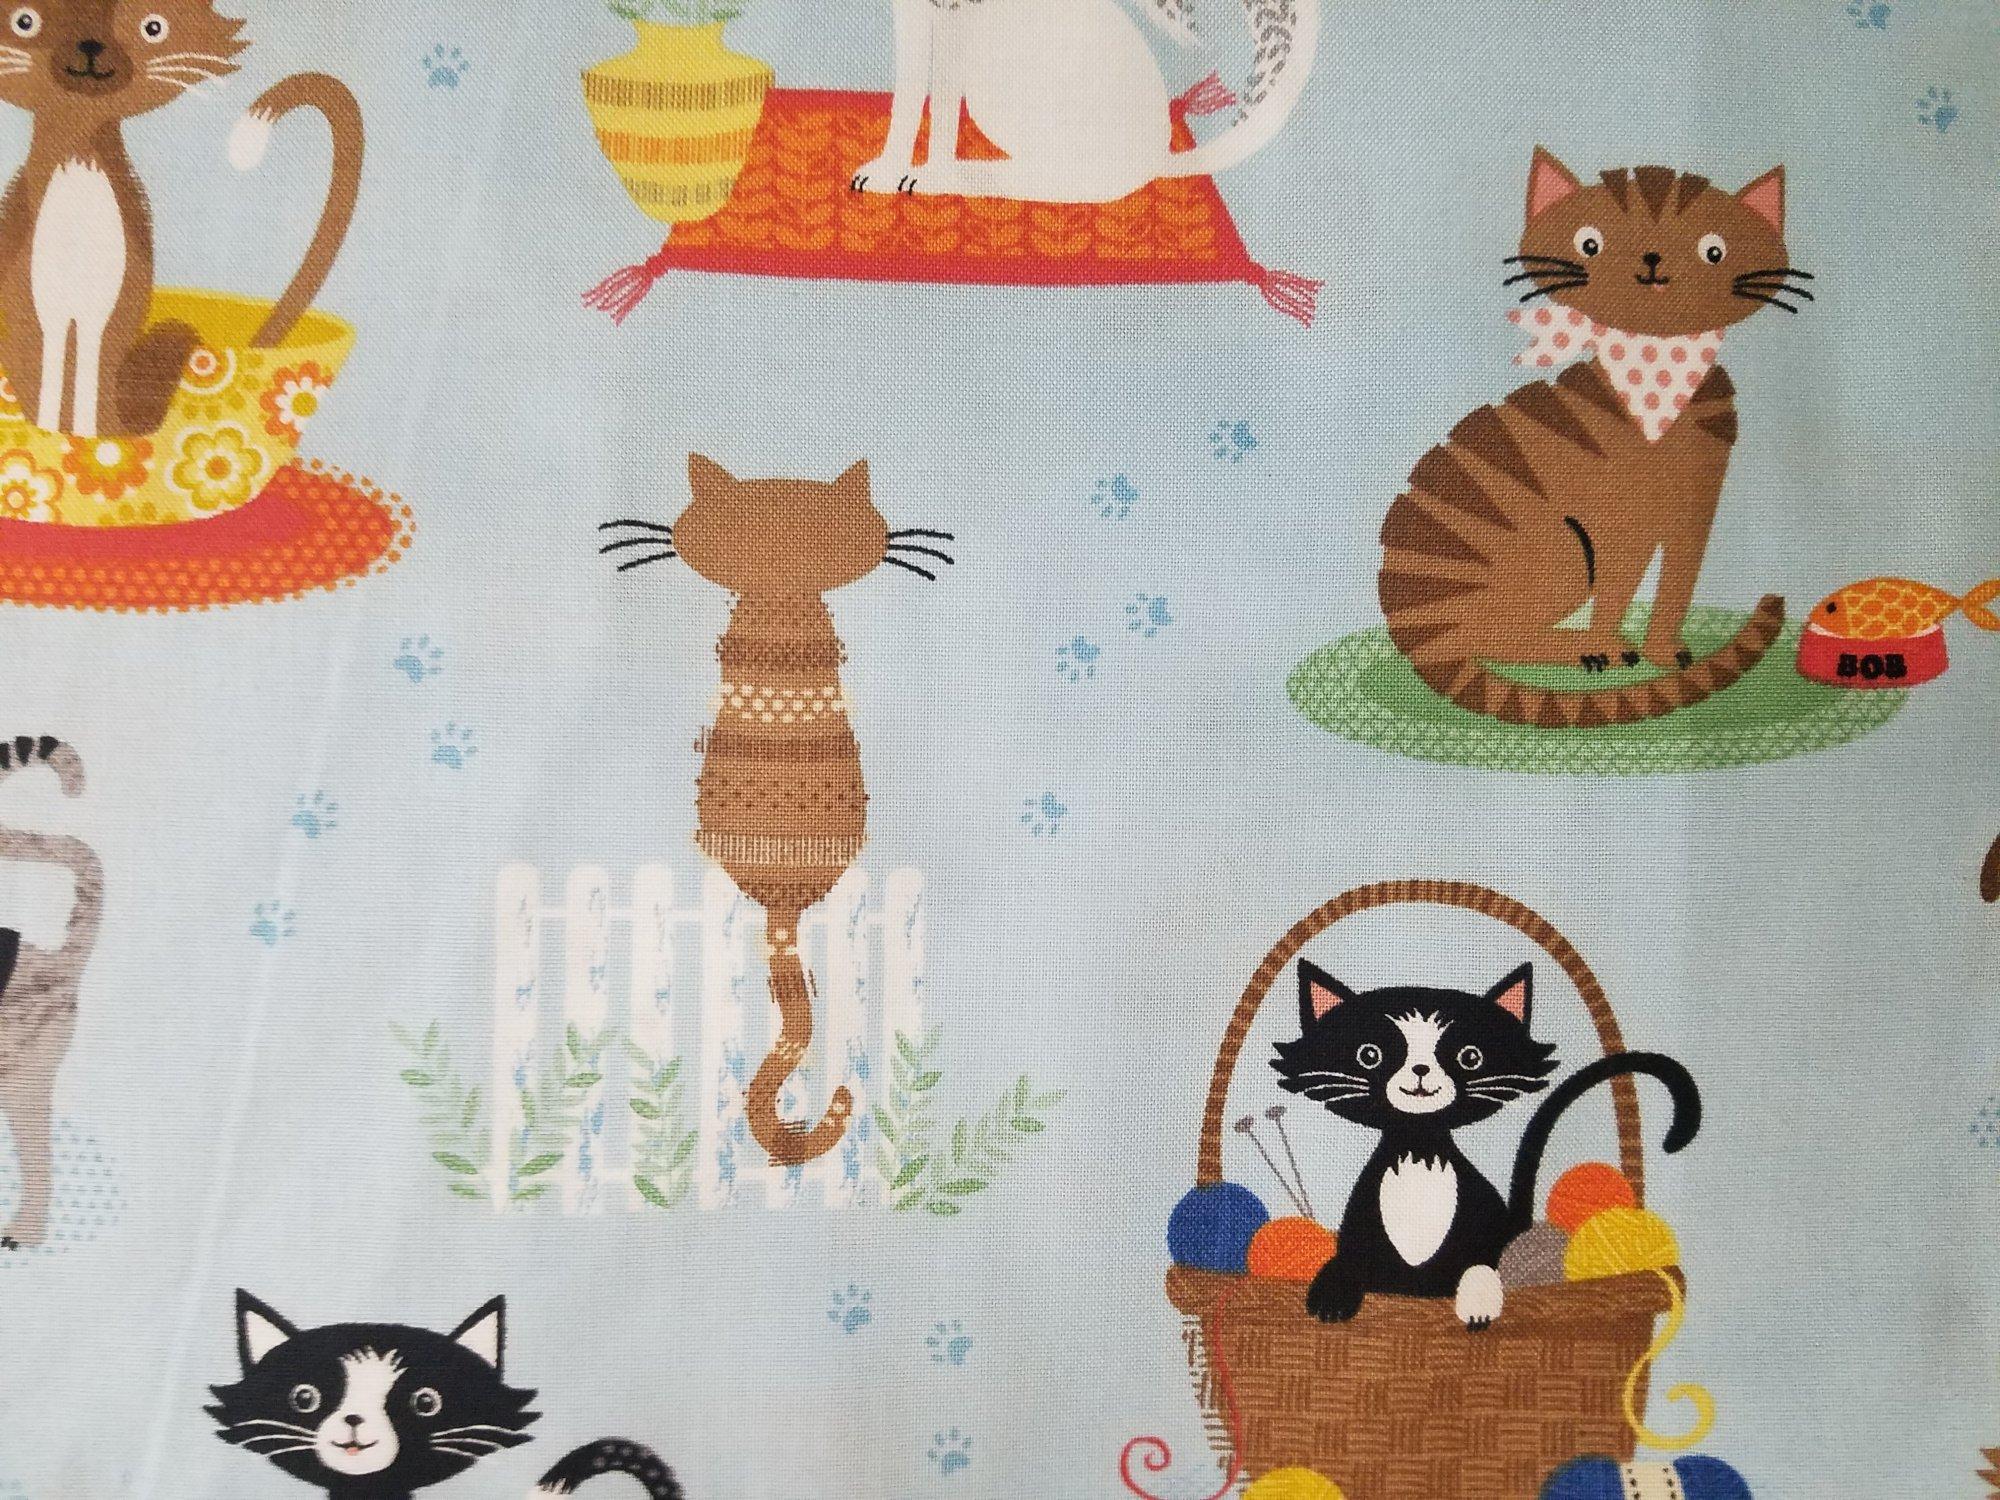 Crafty Cats TP 1723 1